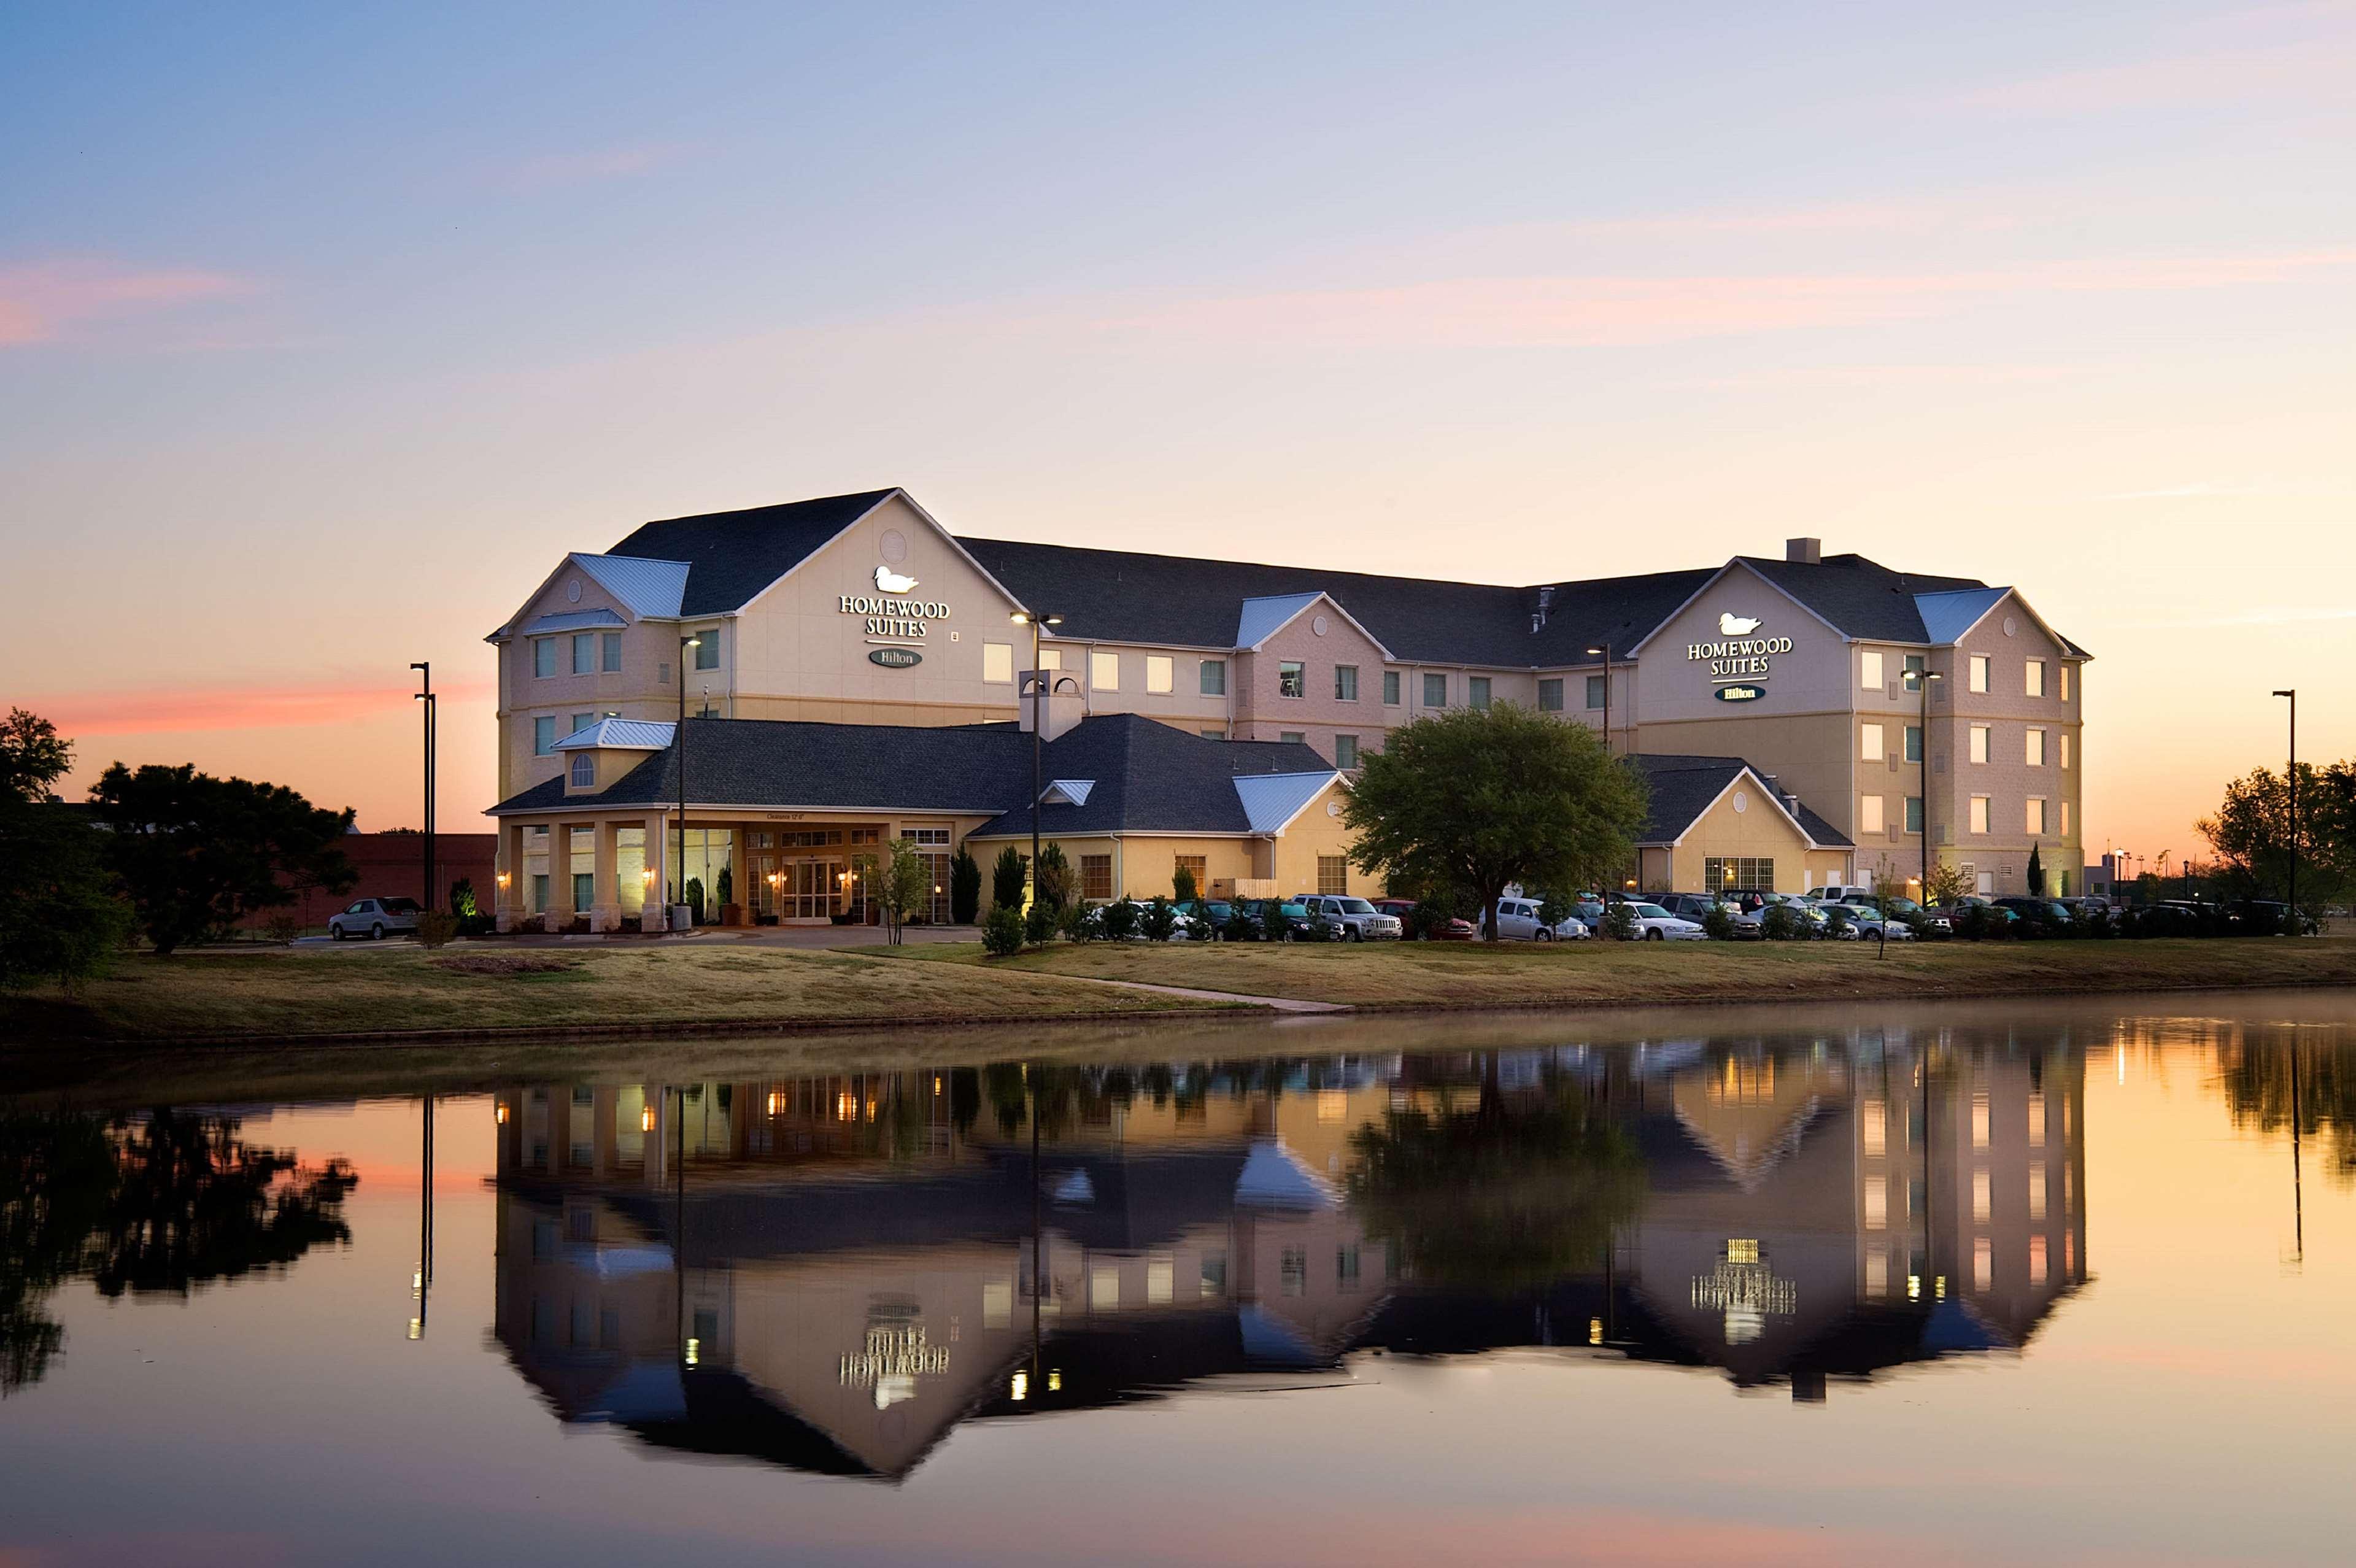 Homewood Suites by Hilton Wichita Falls image 1